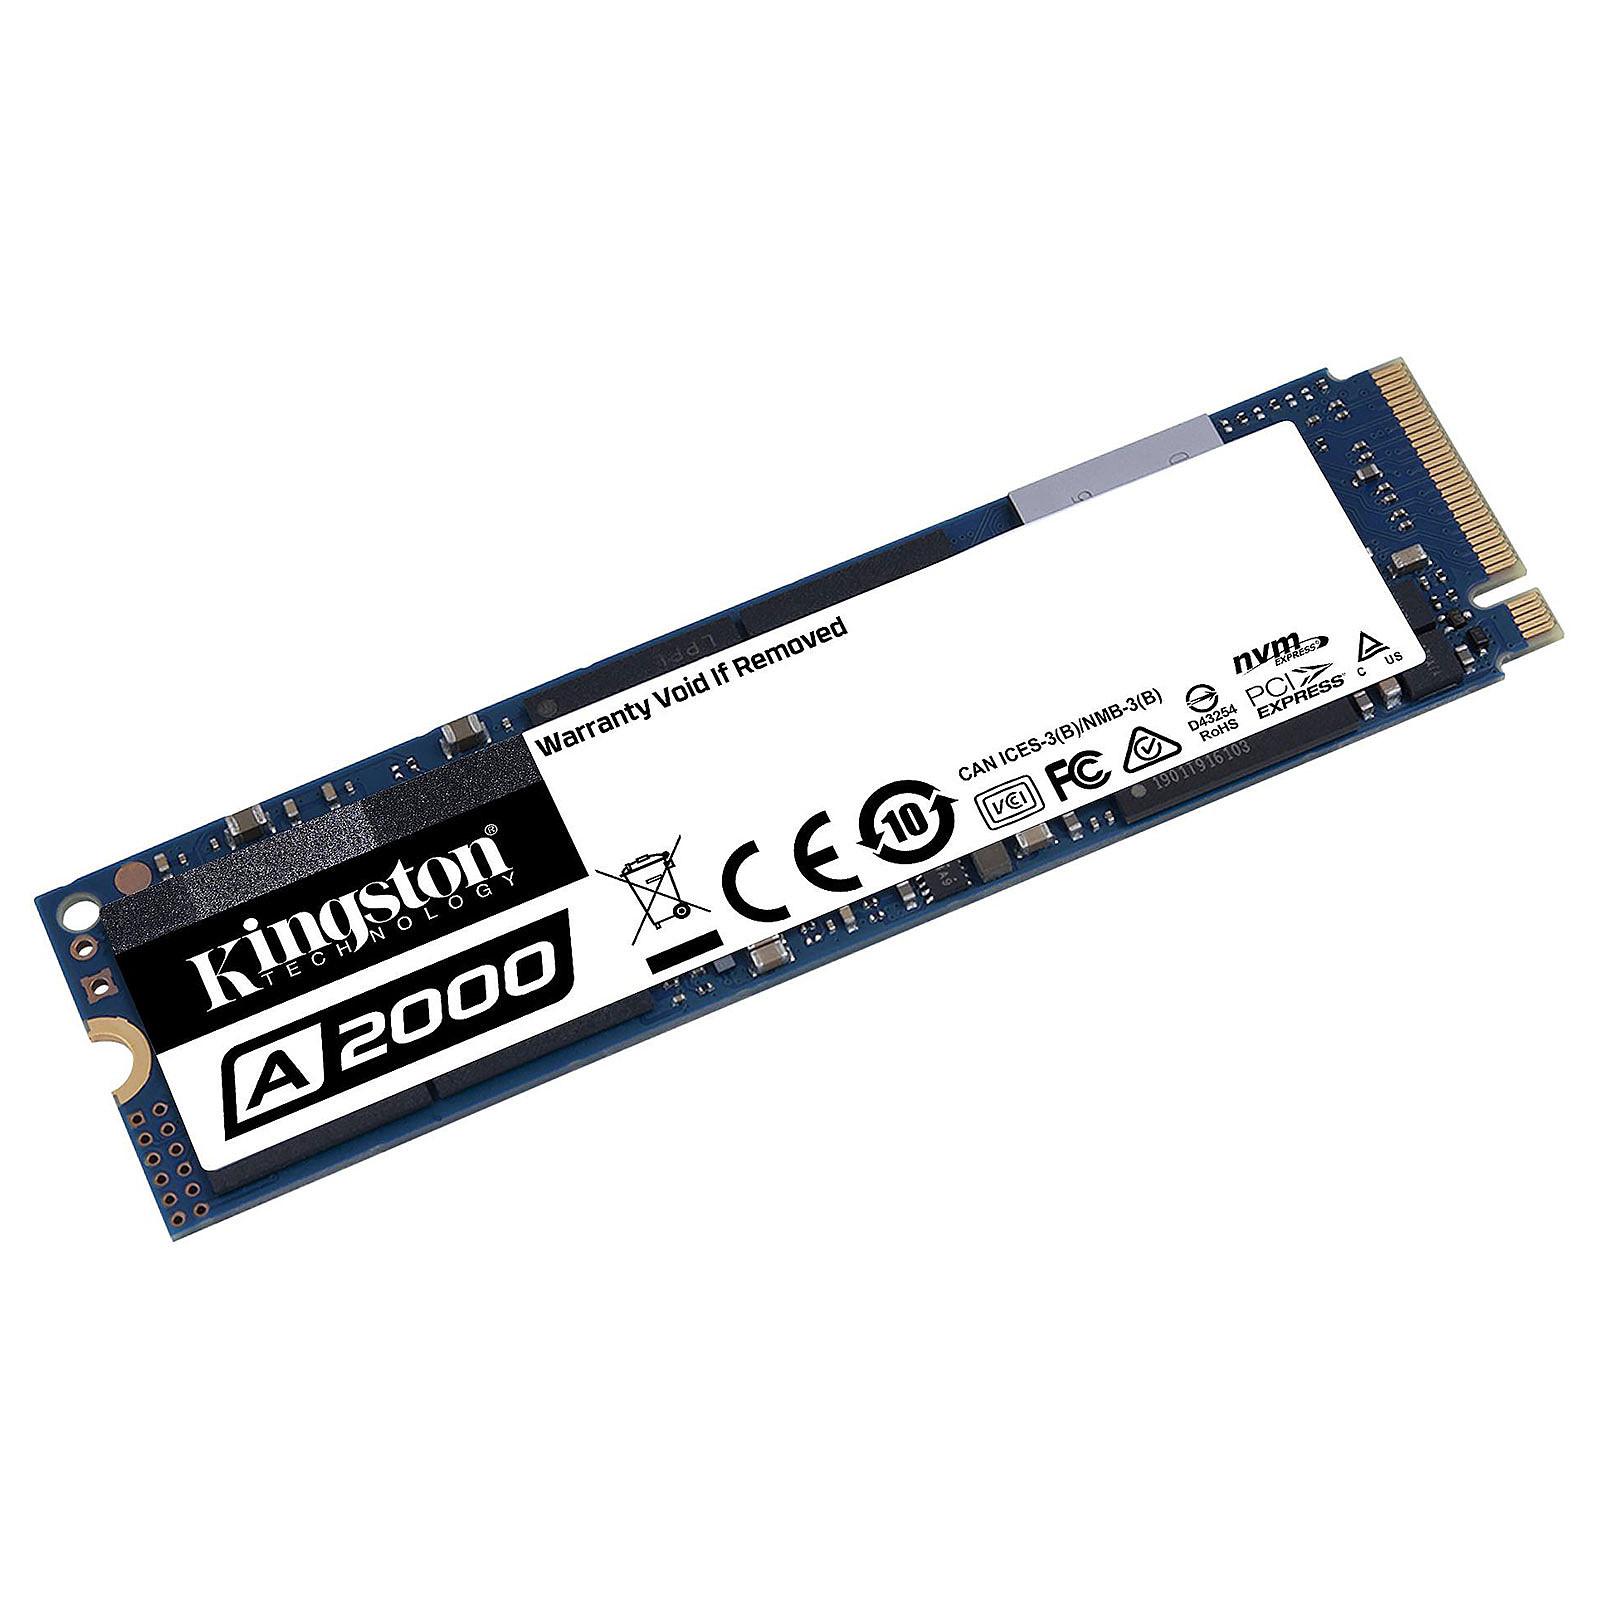 500Go SSD M.2 NVMe - SA2000M8/500G (SA2000M8/500G) - Achat / Vente Disque SSD sur Picata.fr - 0